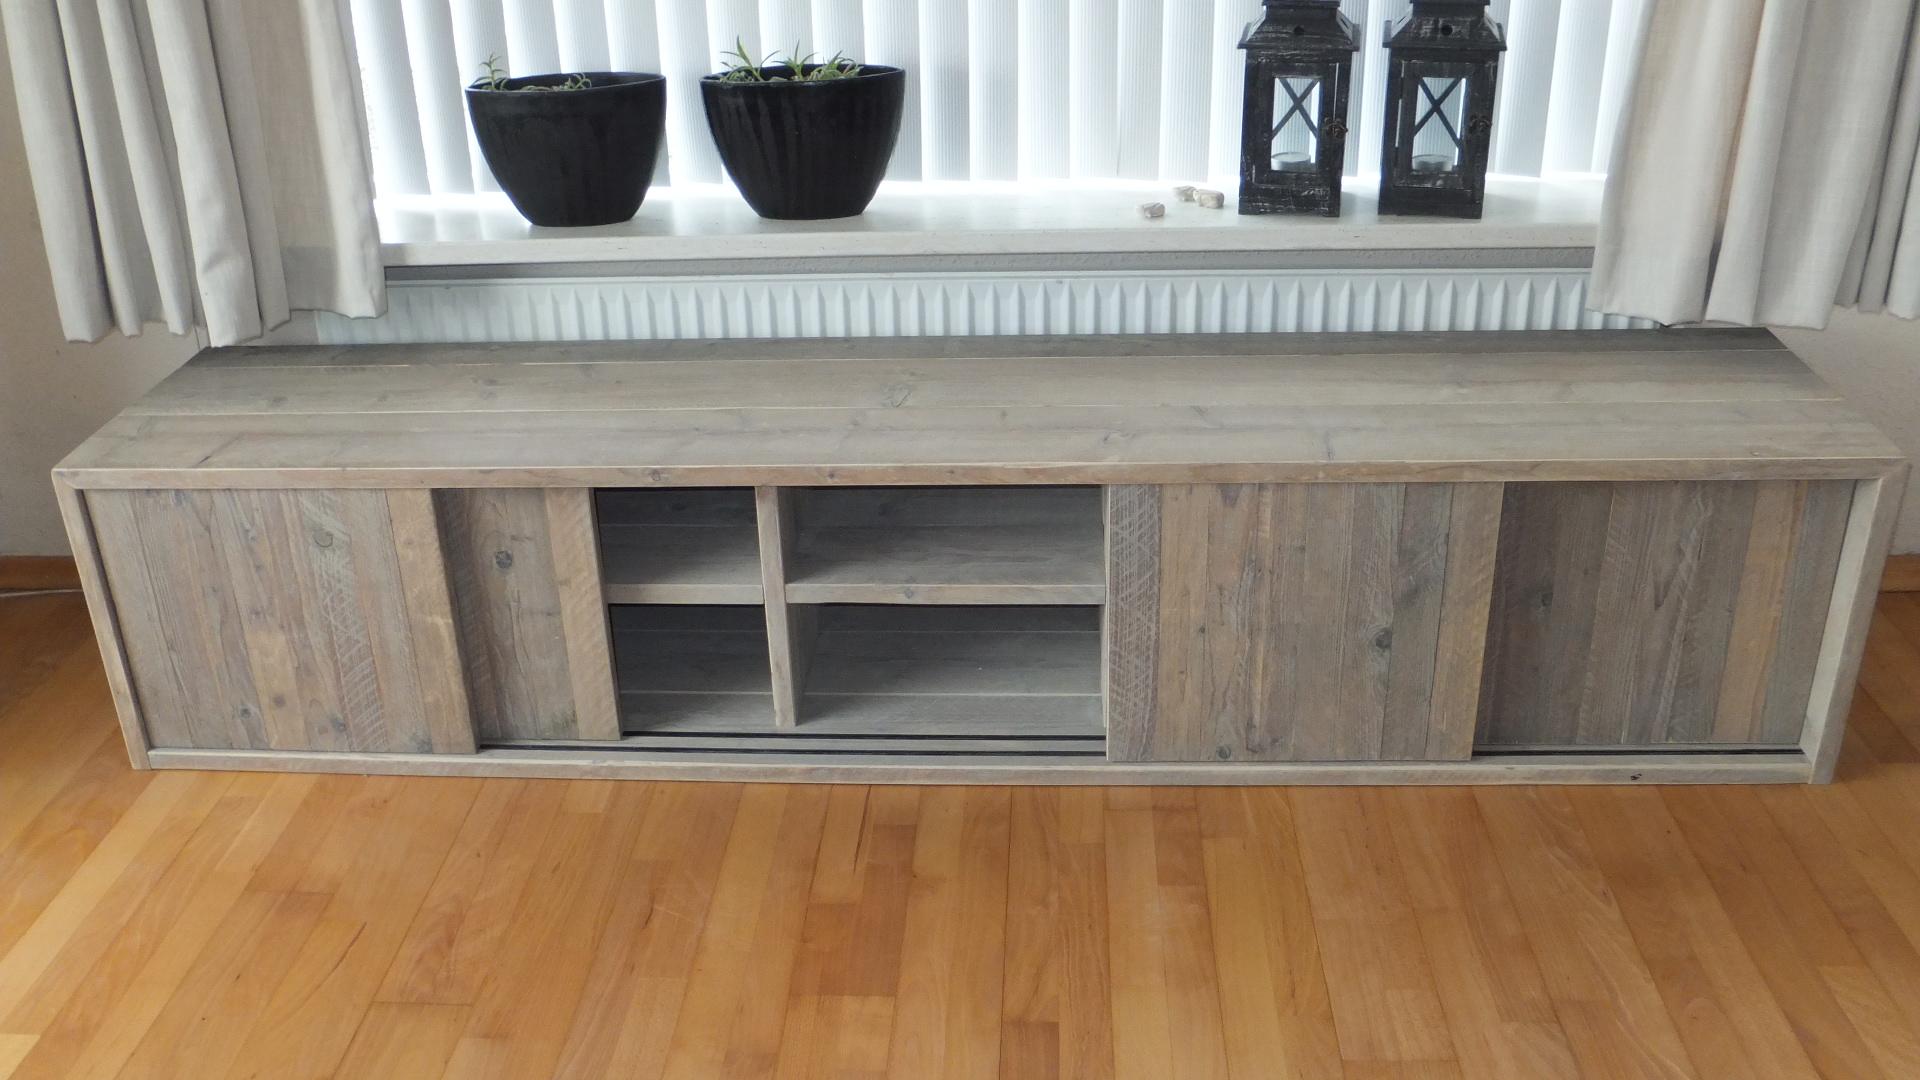 Steigerhouten tv meubel jl meubelmaatwerk for Steigerhout tv meubel maken